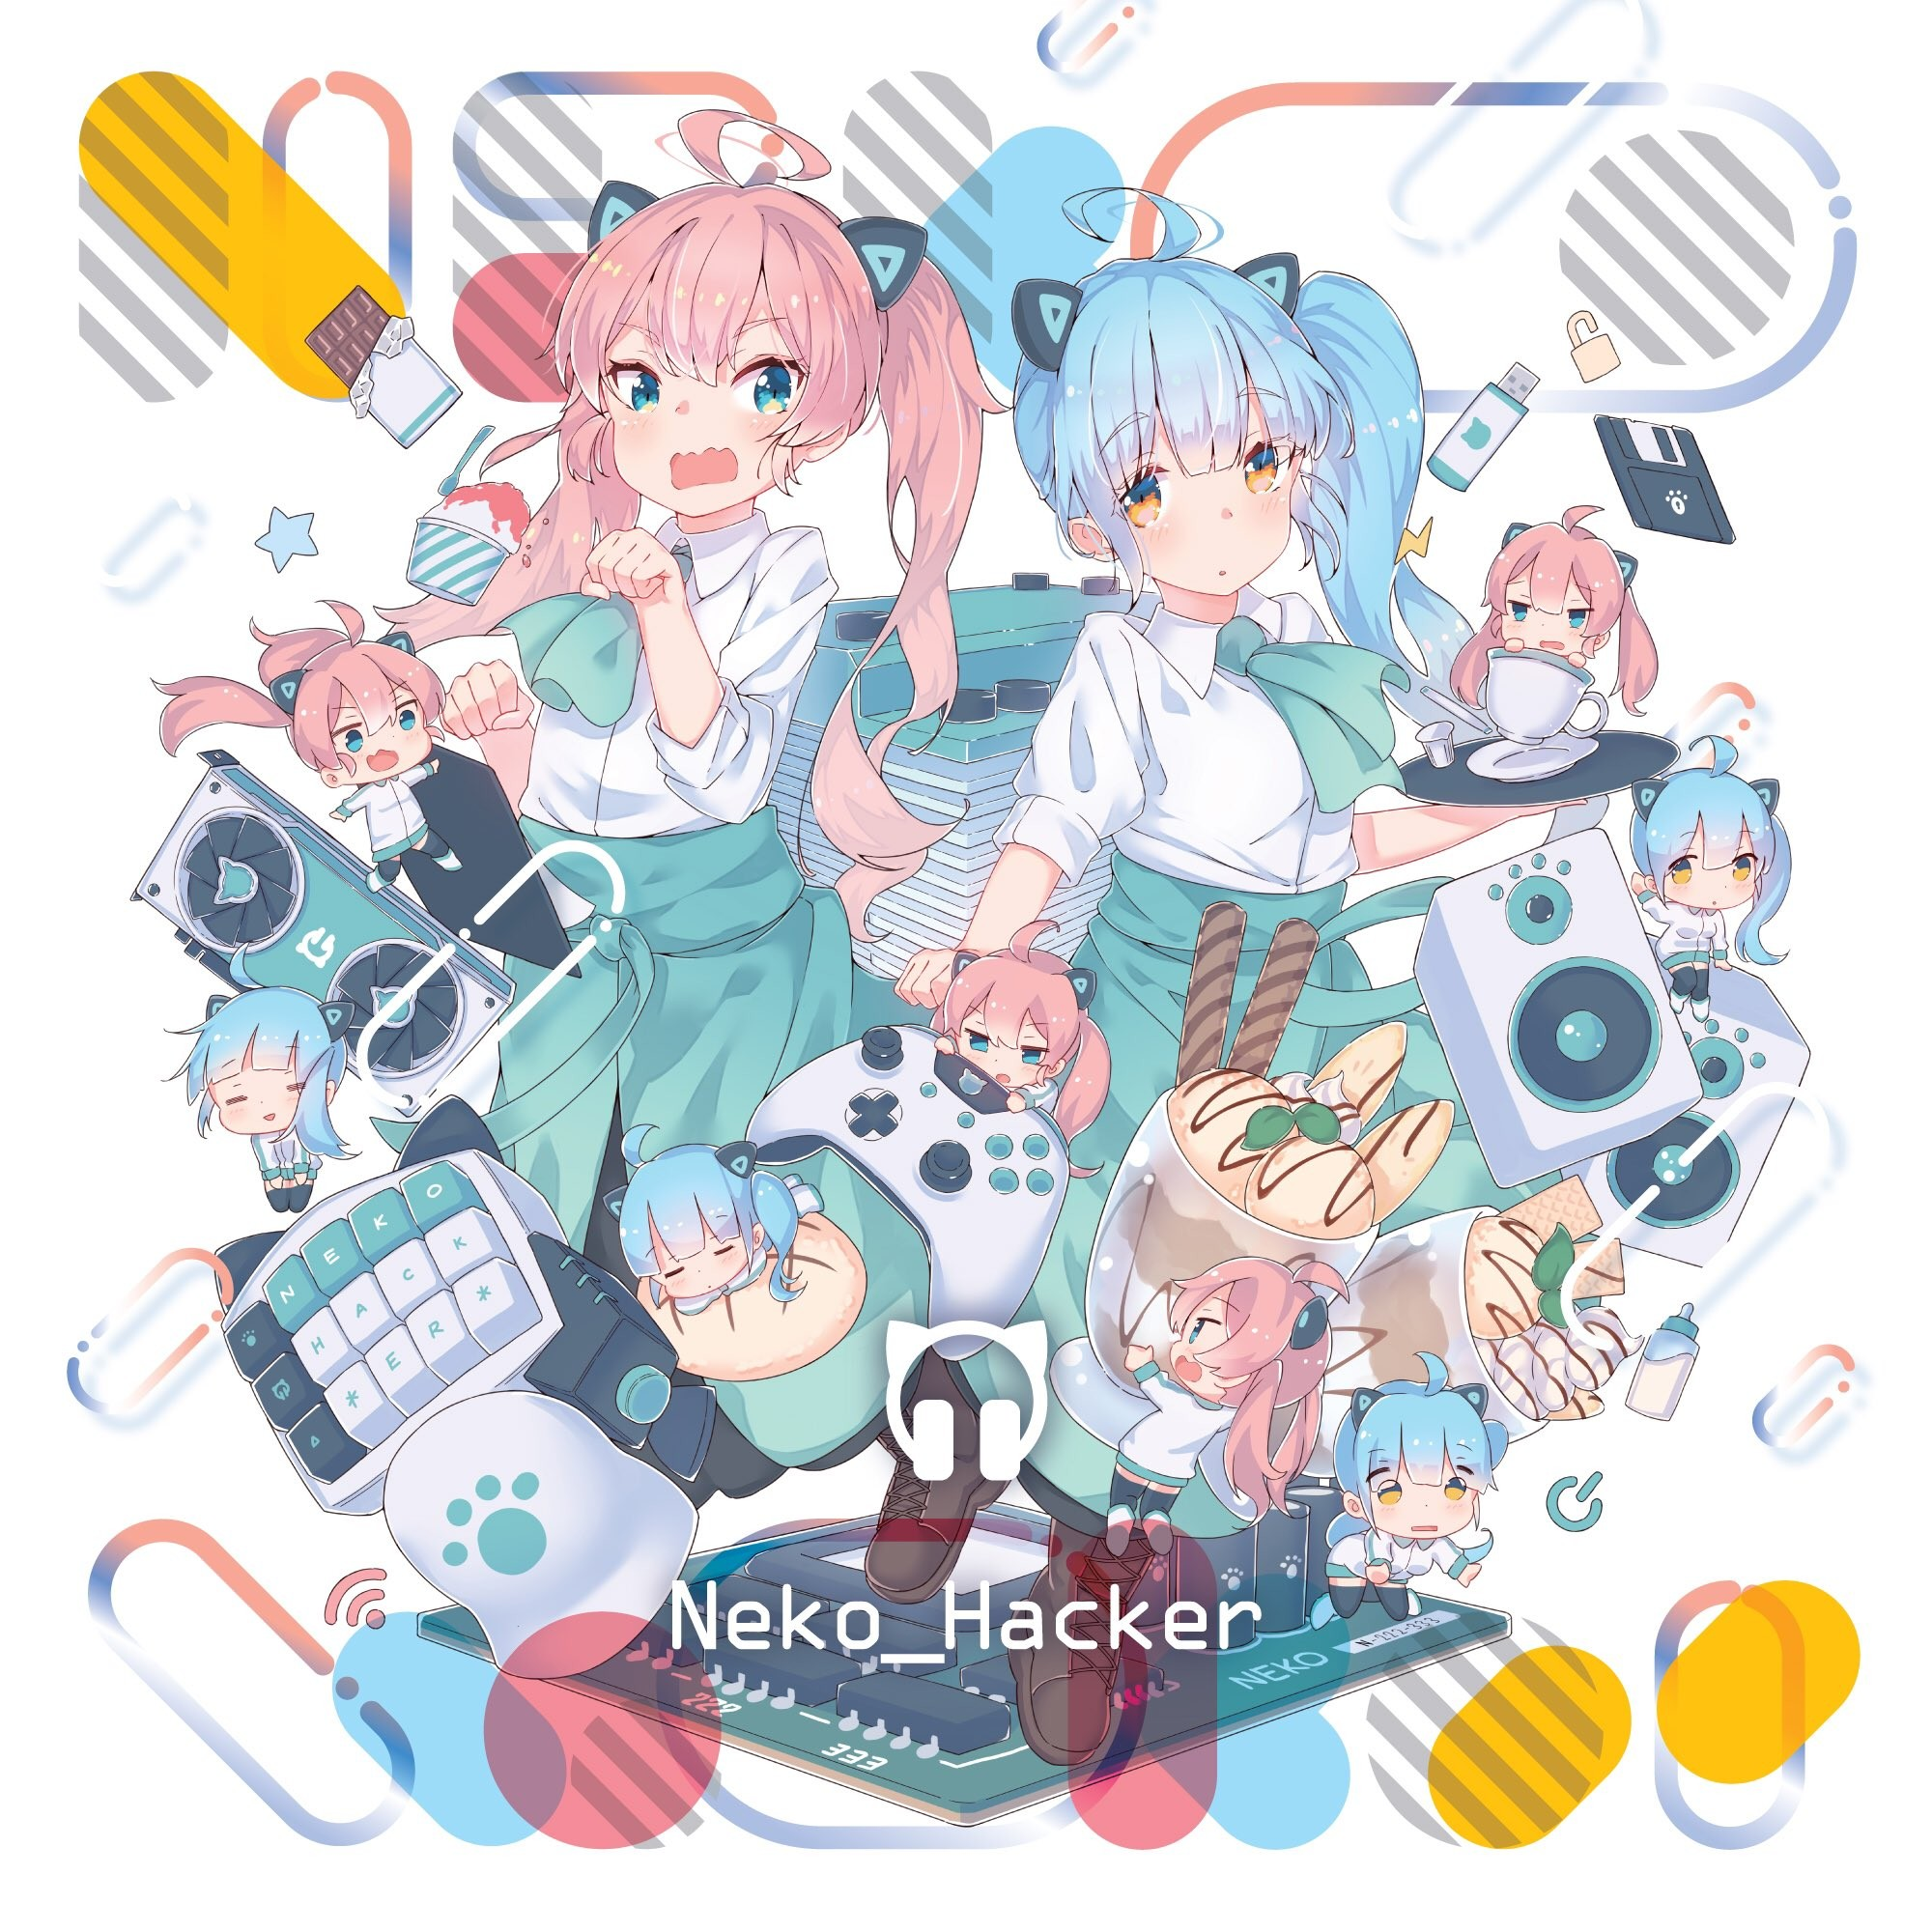 Neko Hacker – Neko Hacker [Mora FLAC 24bit/192kHz]